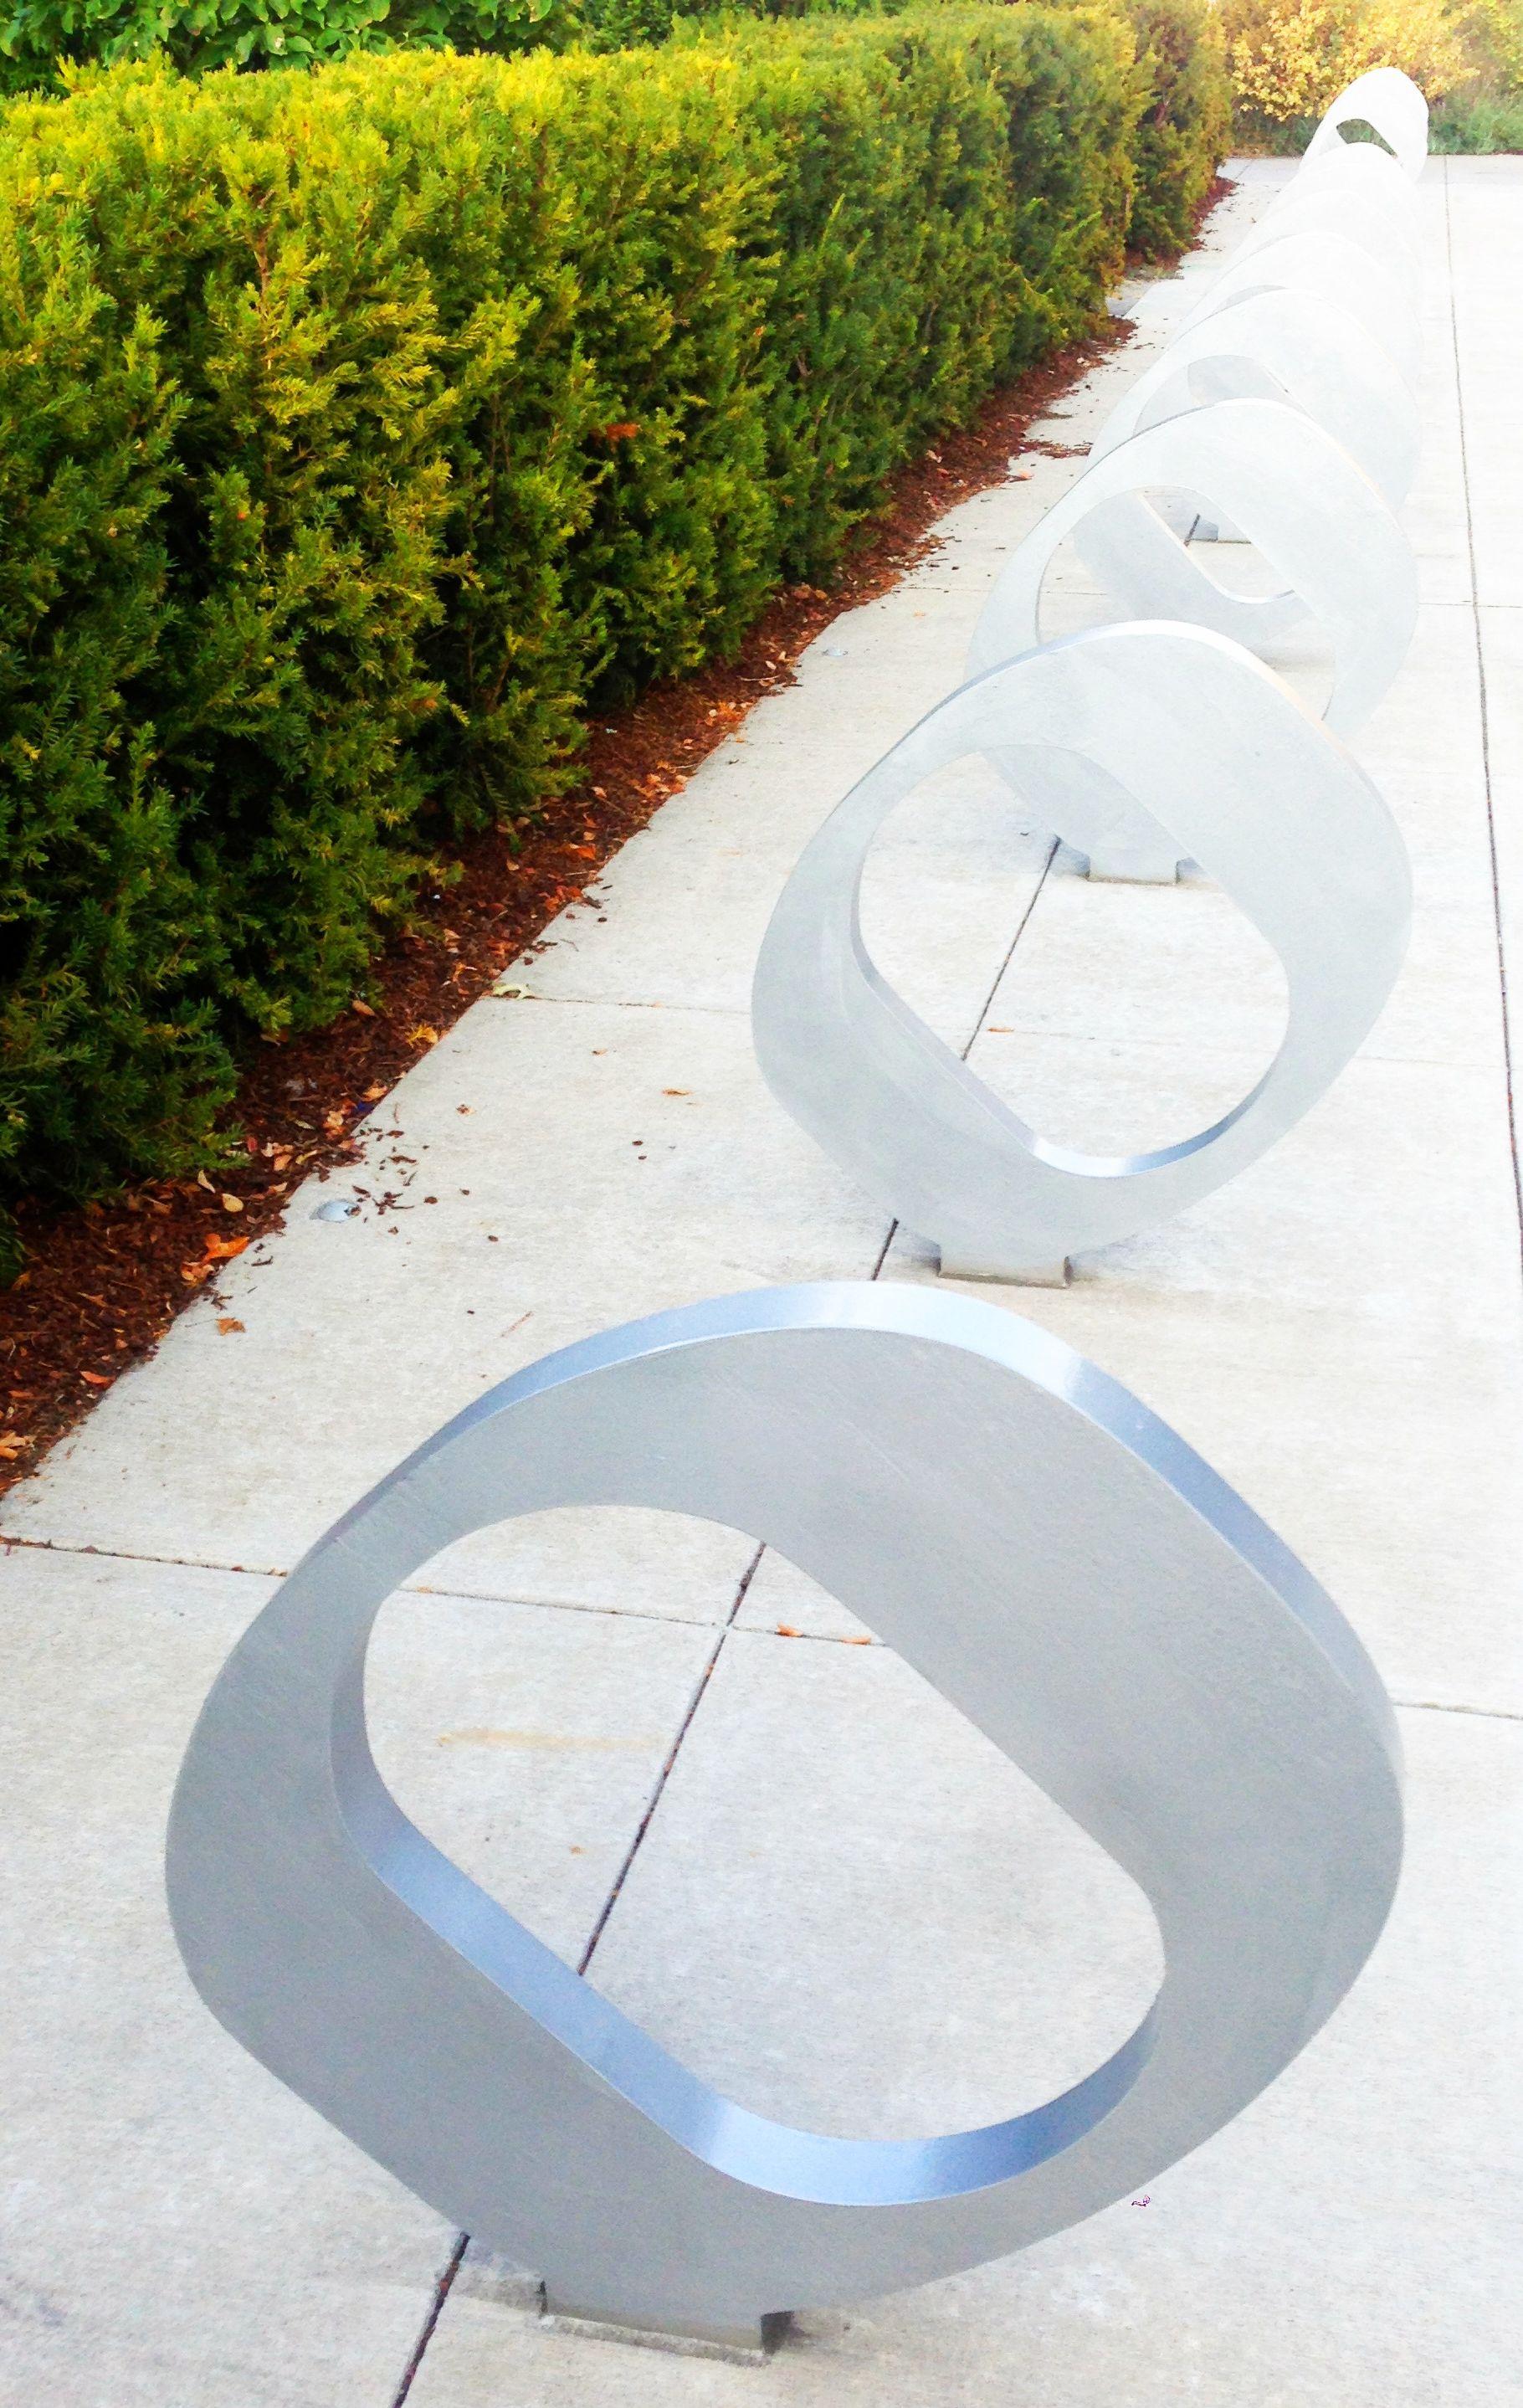 bike racks on campus  By www.russlong.com